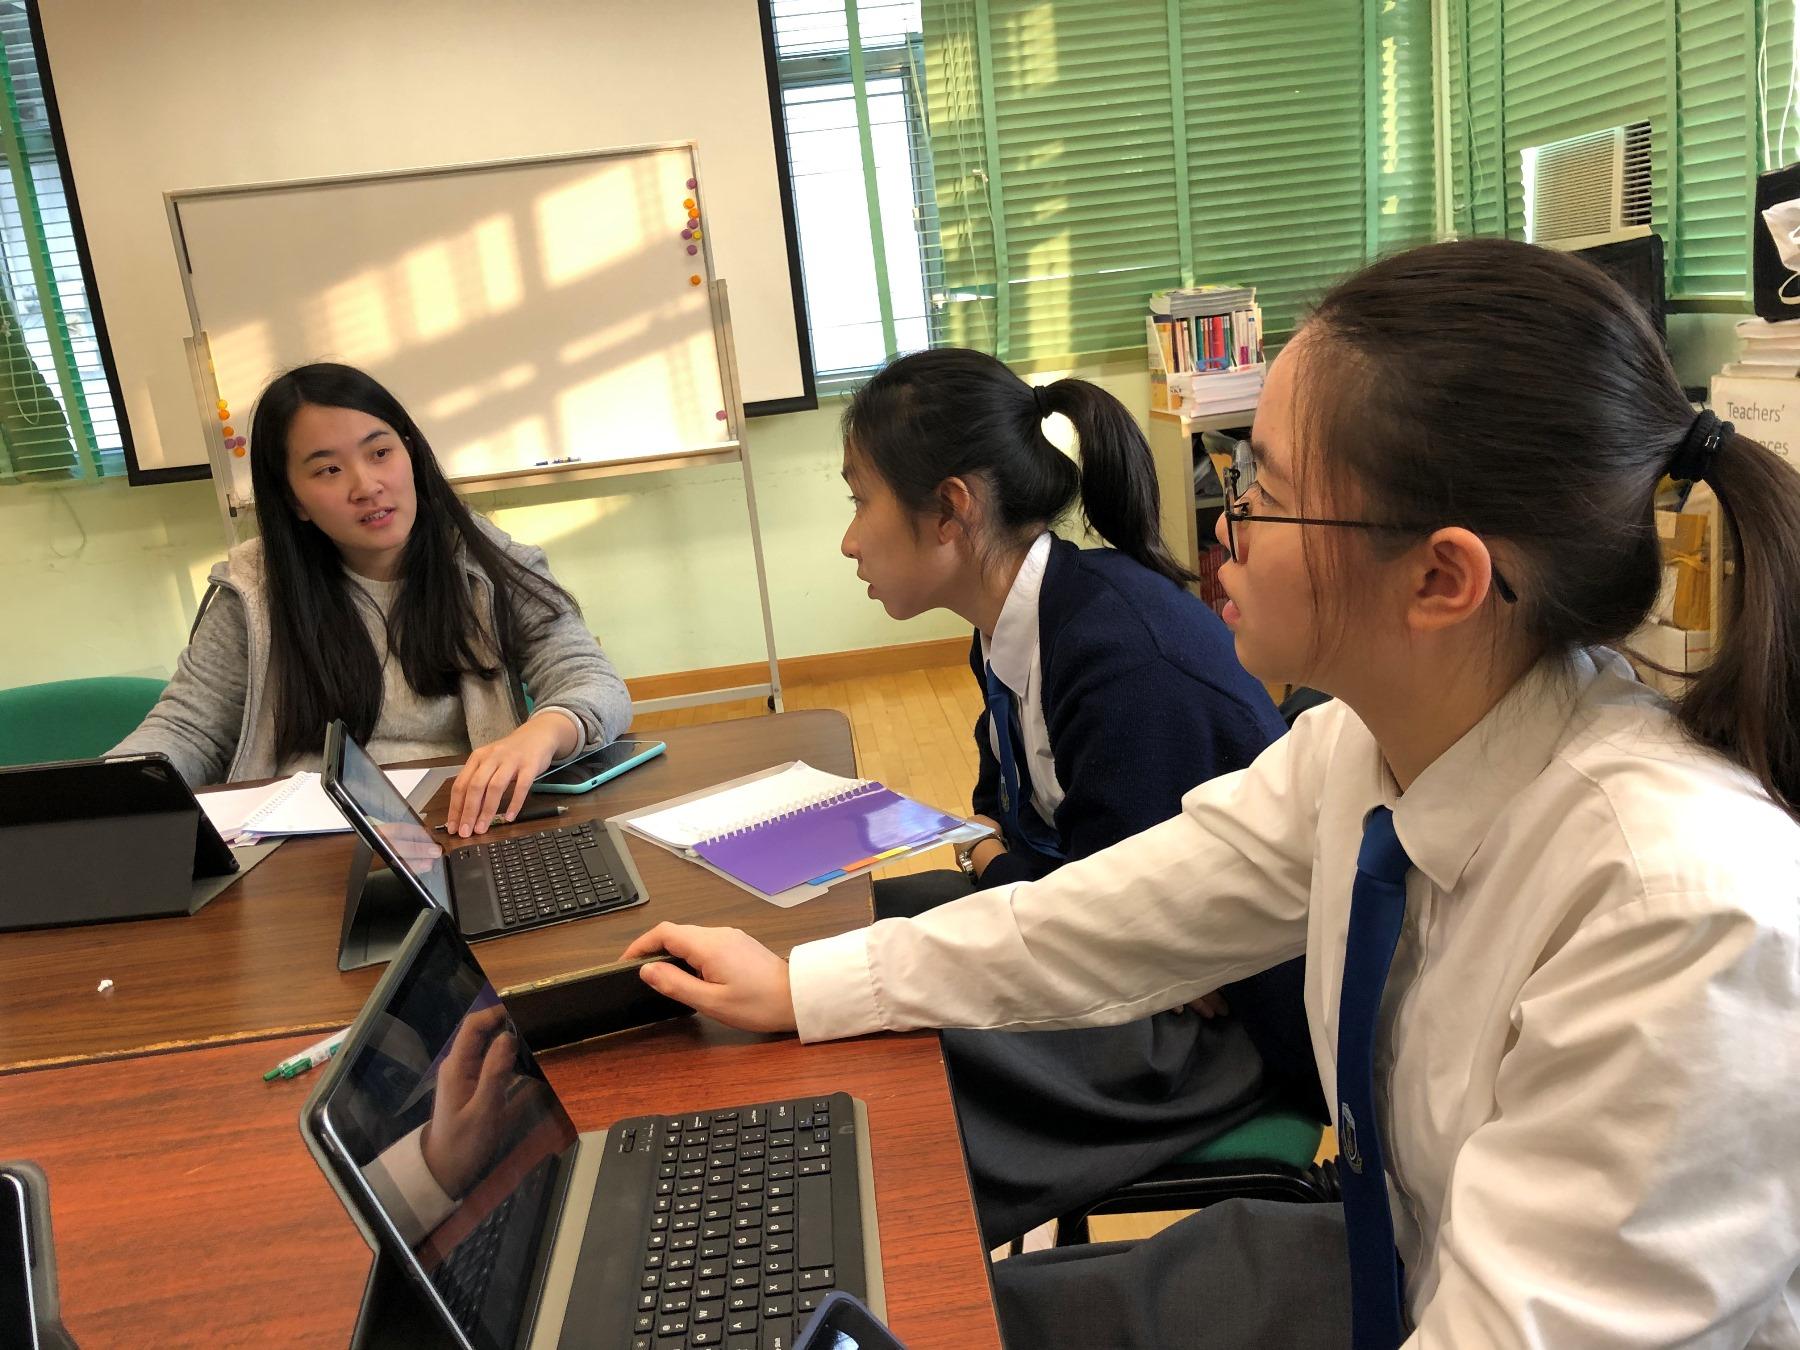 https://npc.edu.hk/sites/default/files/img_3807.jpg